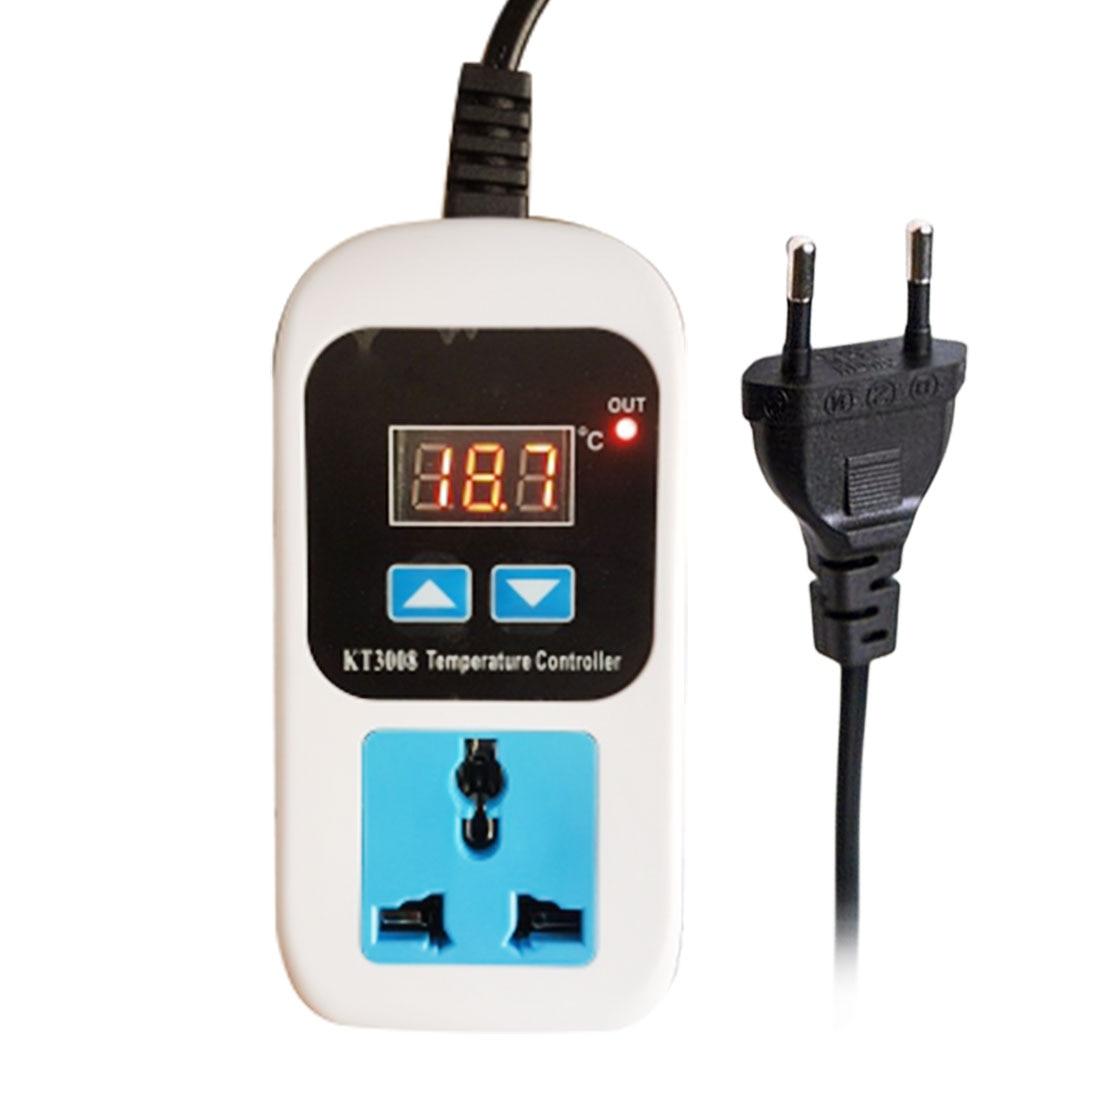 Regulator Temperature Controller Microcomputer Socket Outlet AC110-220V + NTC Sensor KT3008 KT3009A Digital Thermostat EU Plug